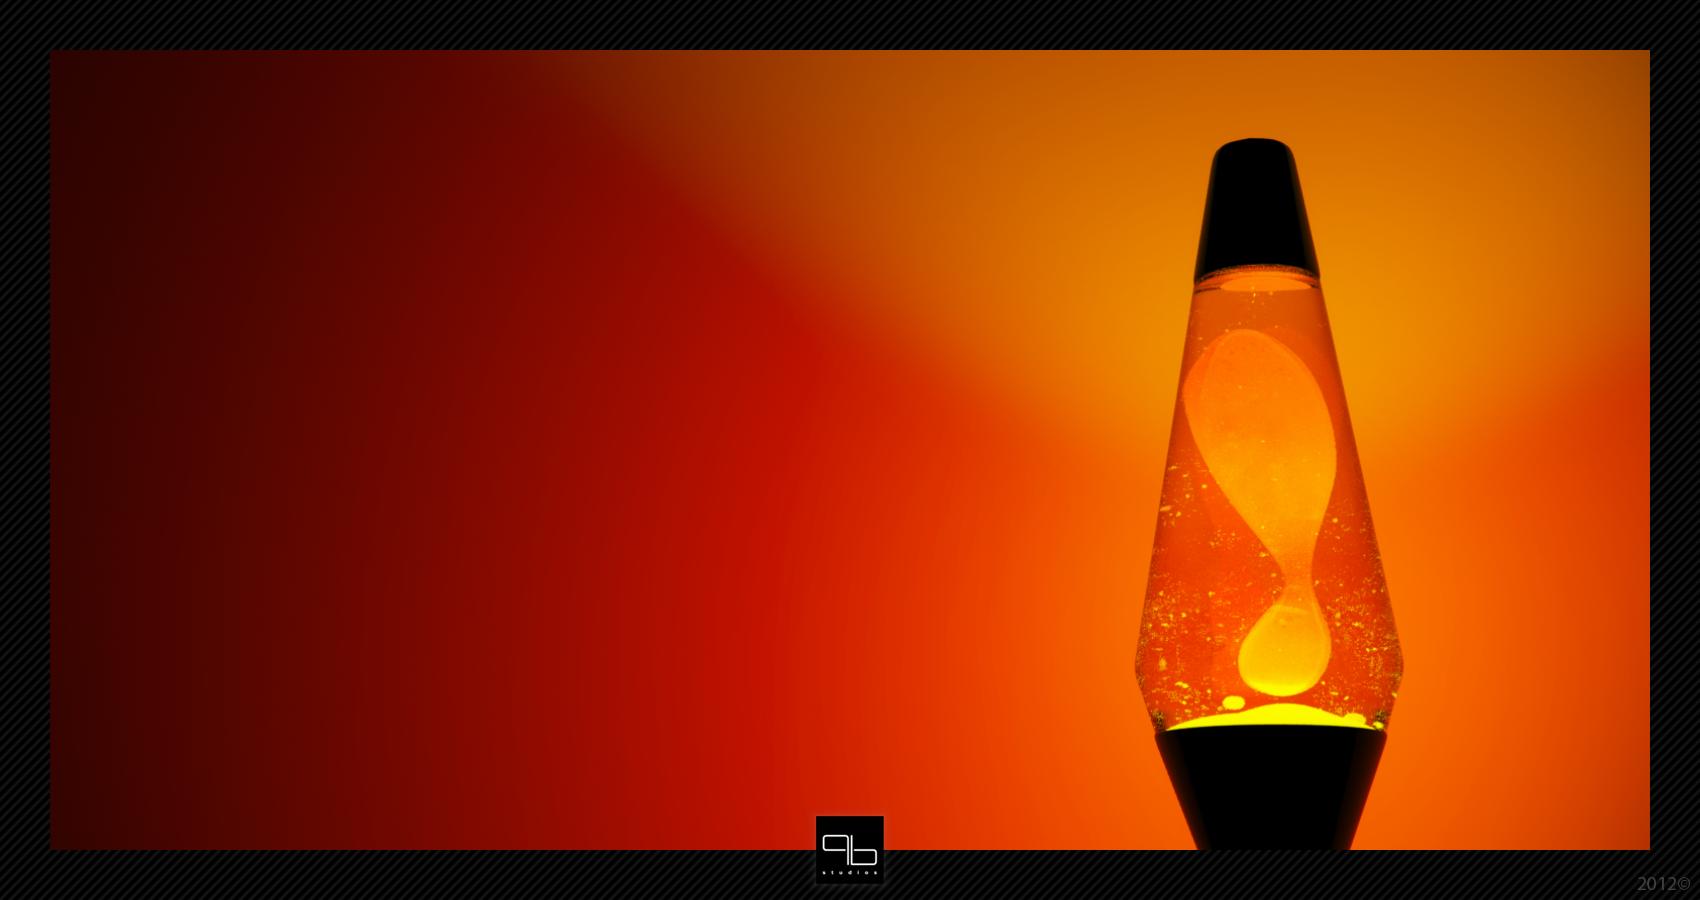 Lava Lamp By Zeropointpolygon On Deviantart